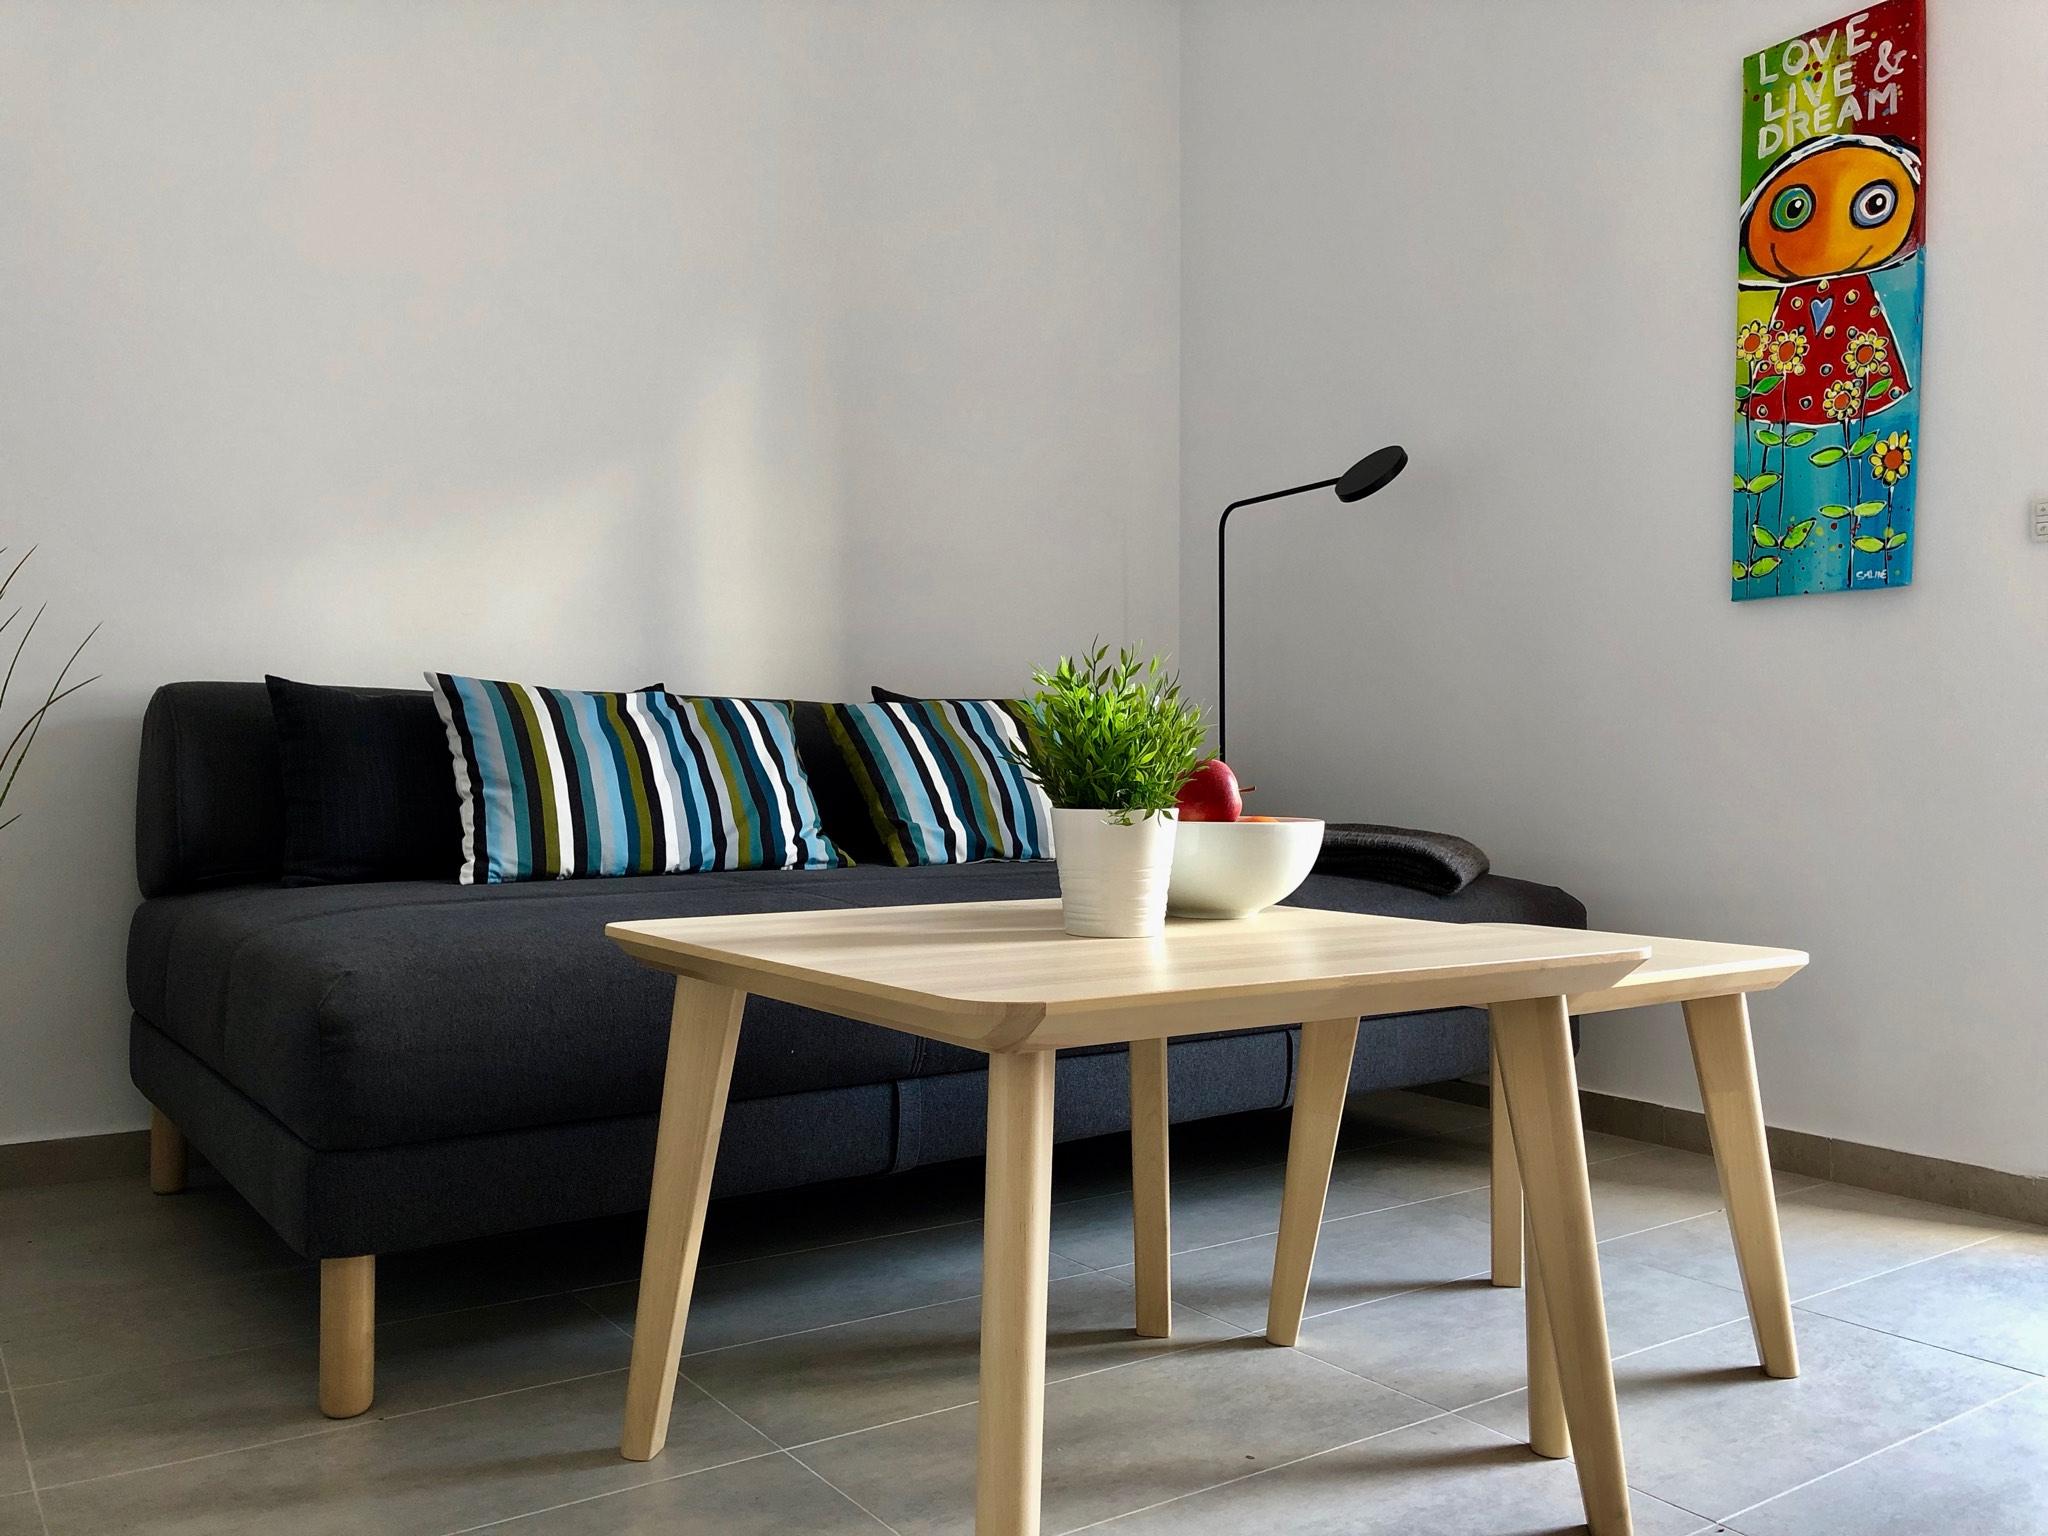 CN41 10 living room sofa bed